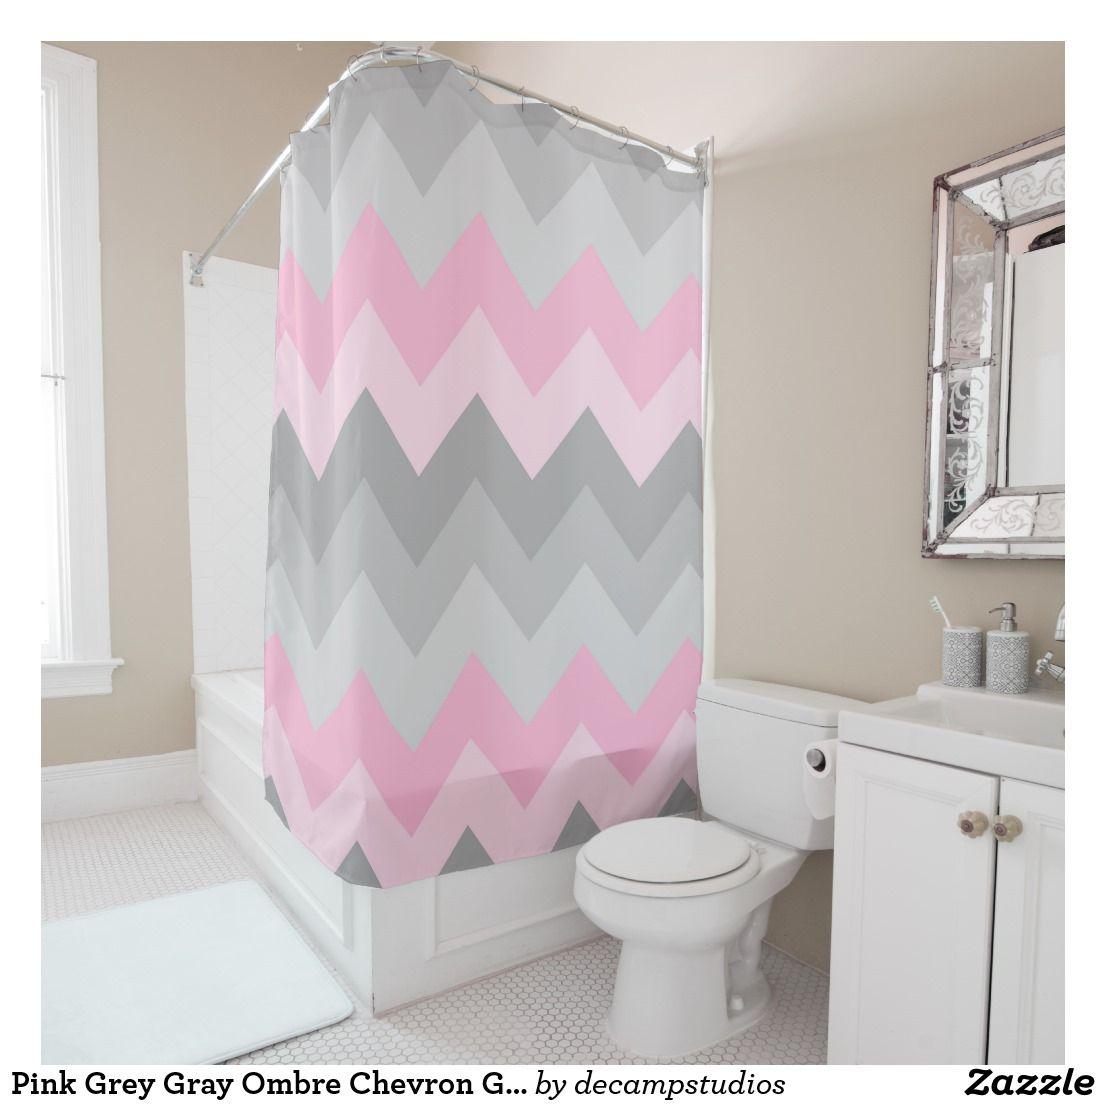 Pink Grey Gray Ombre Chevron Girl Bathroom Shower Curtain